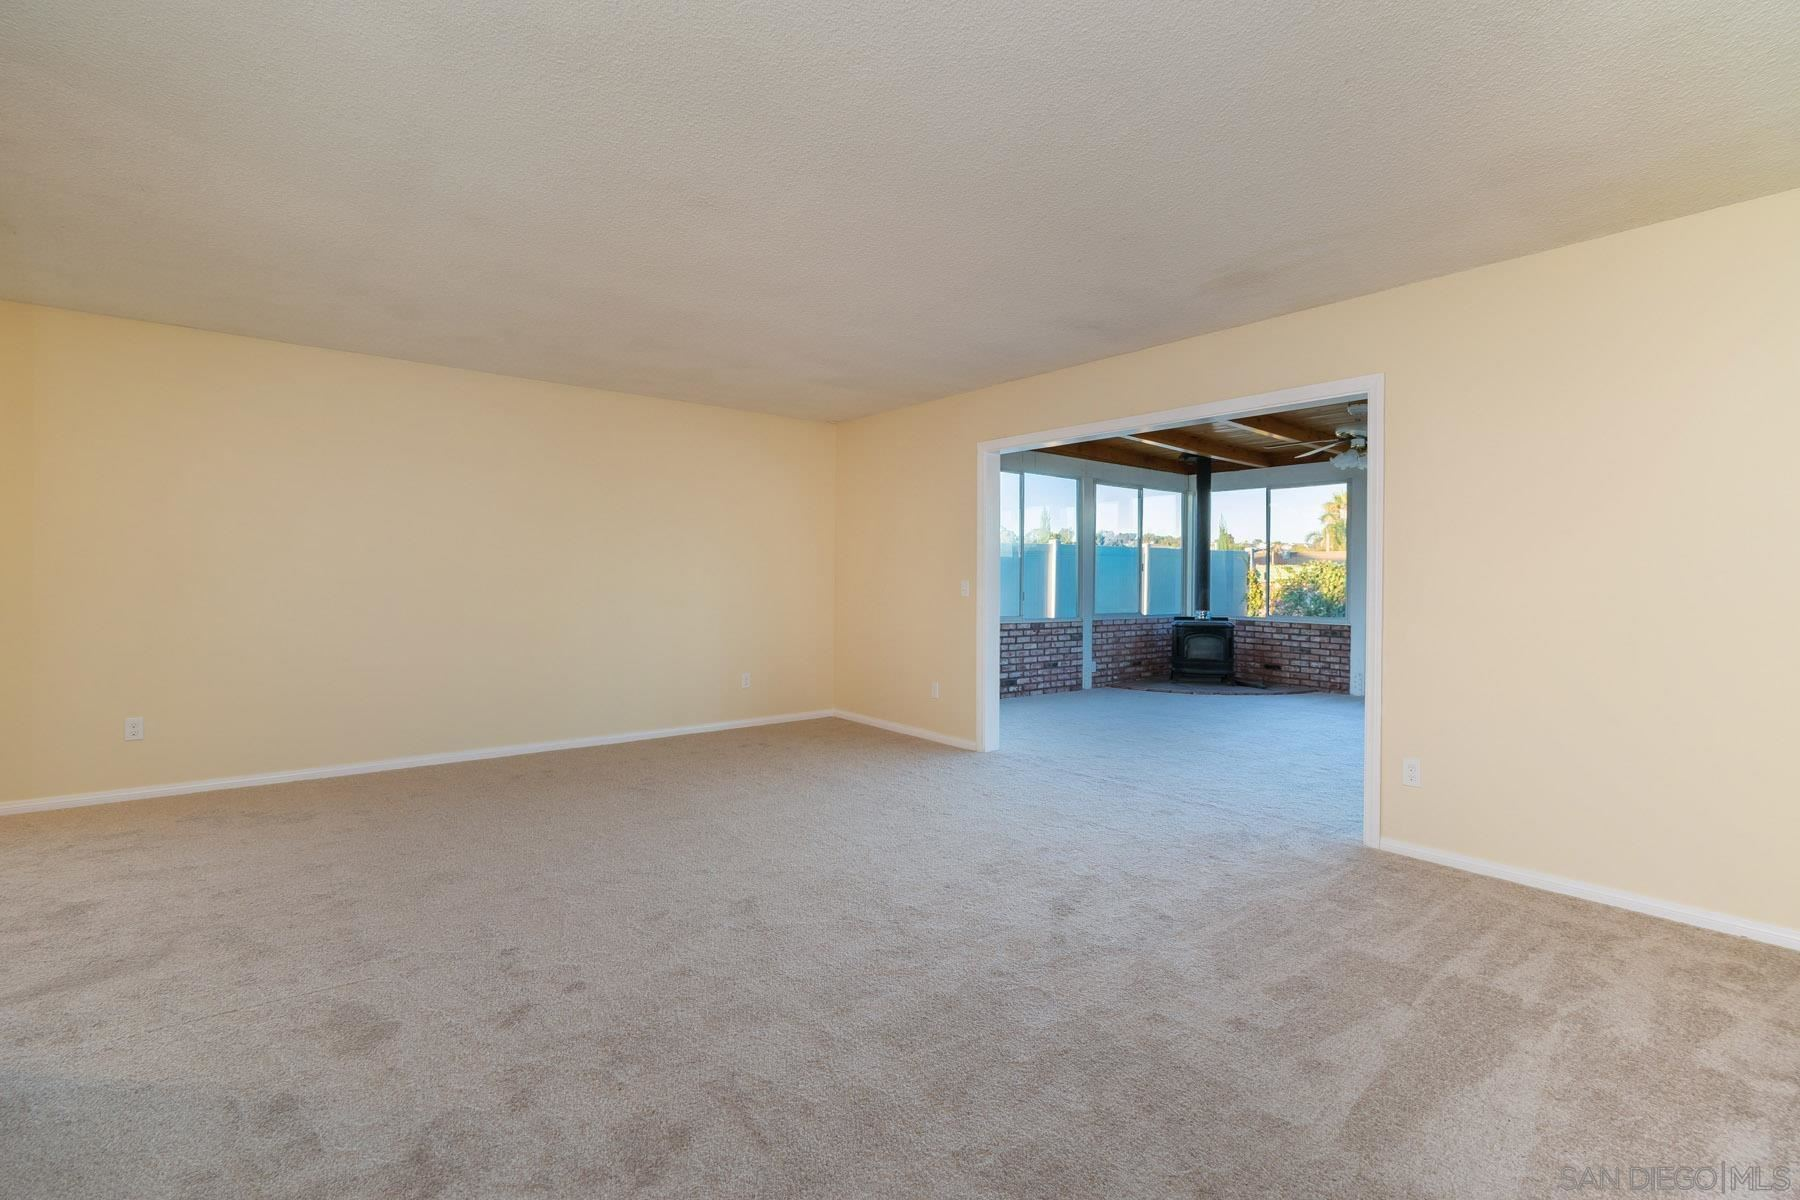 Photo of 1545 Jasper Ave., Chula Vista, CA 91911 (MLS # 210026823)